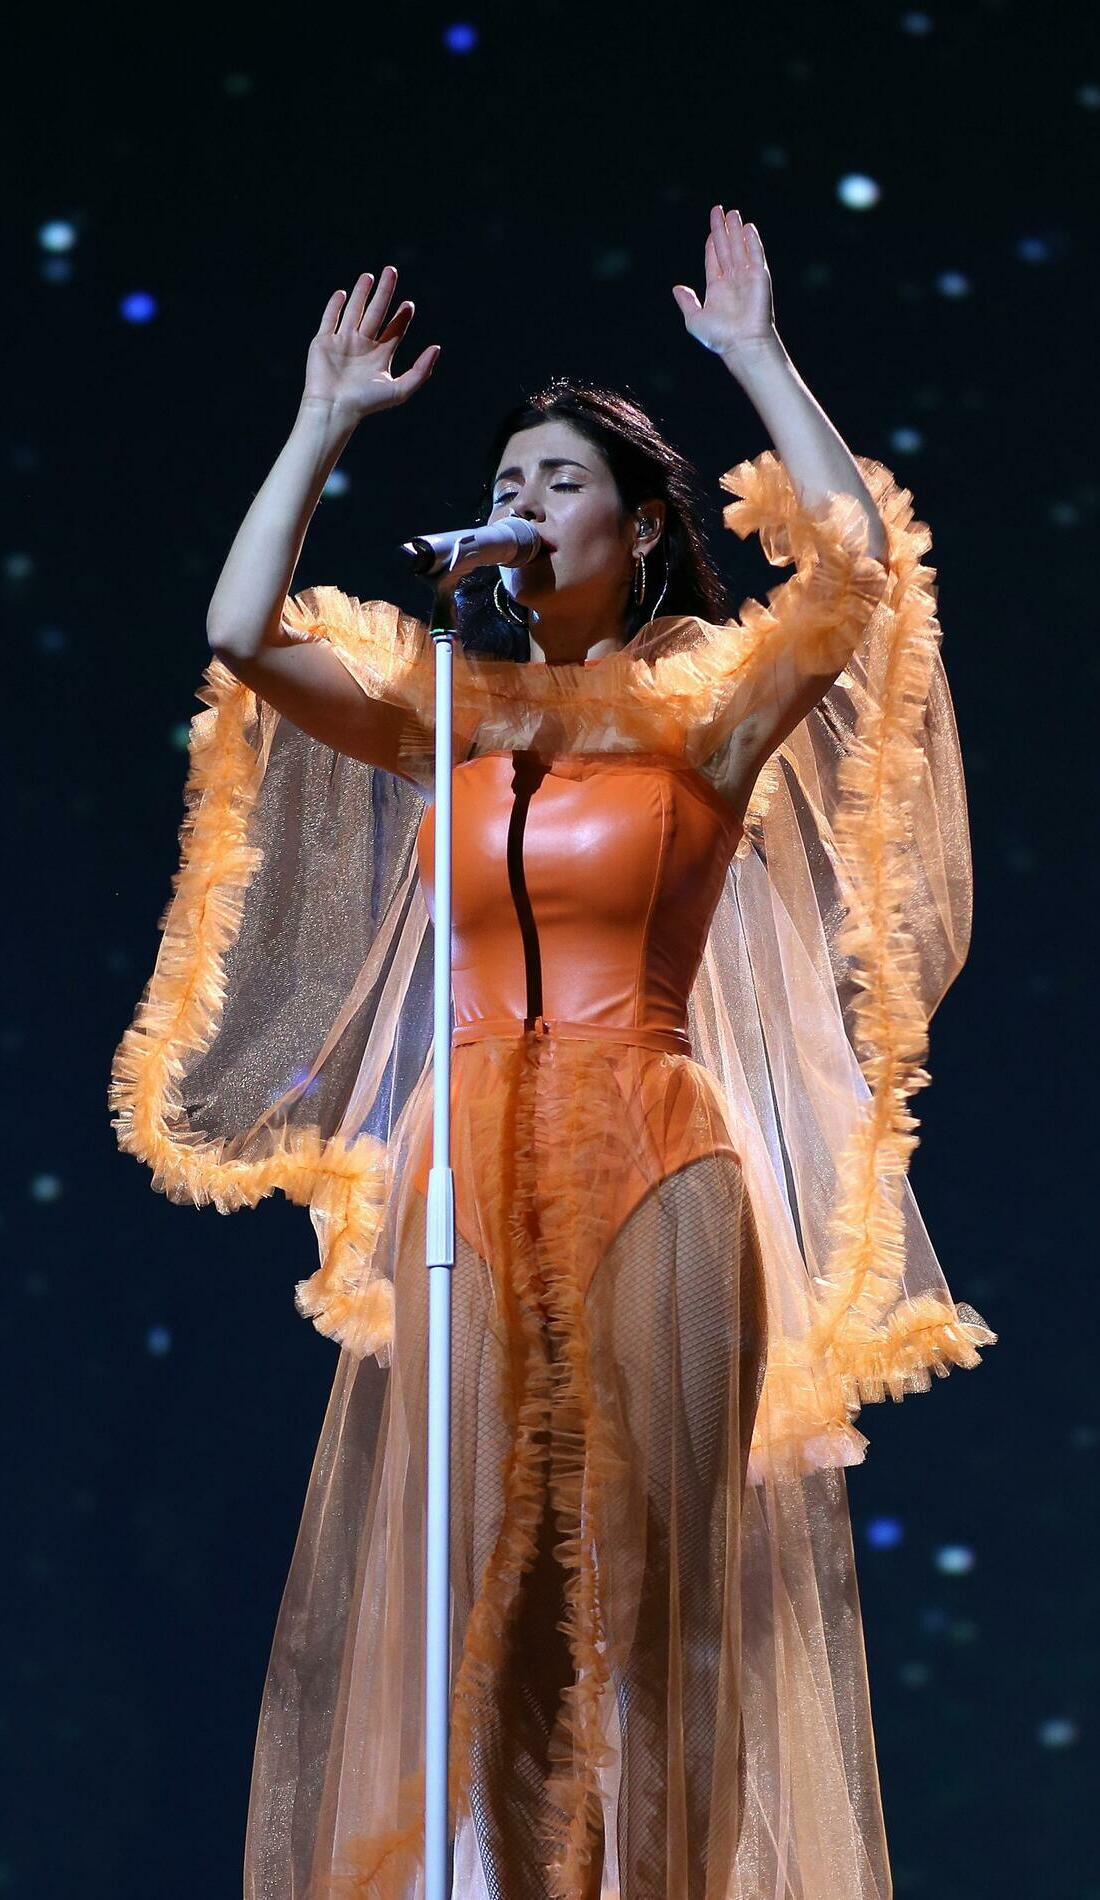 A Marina live event